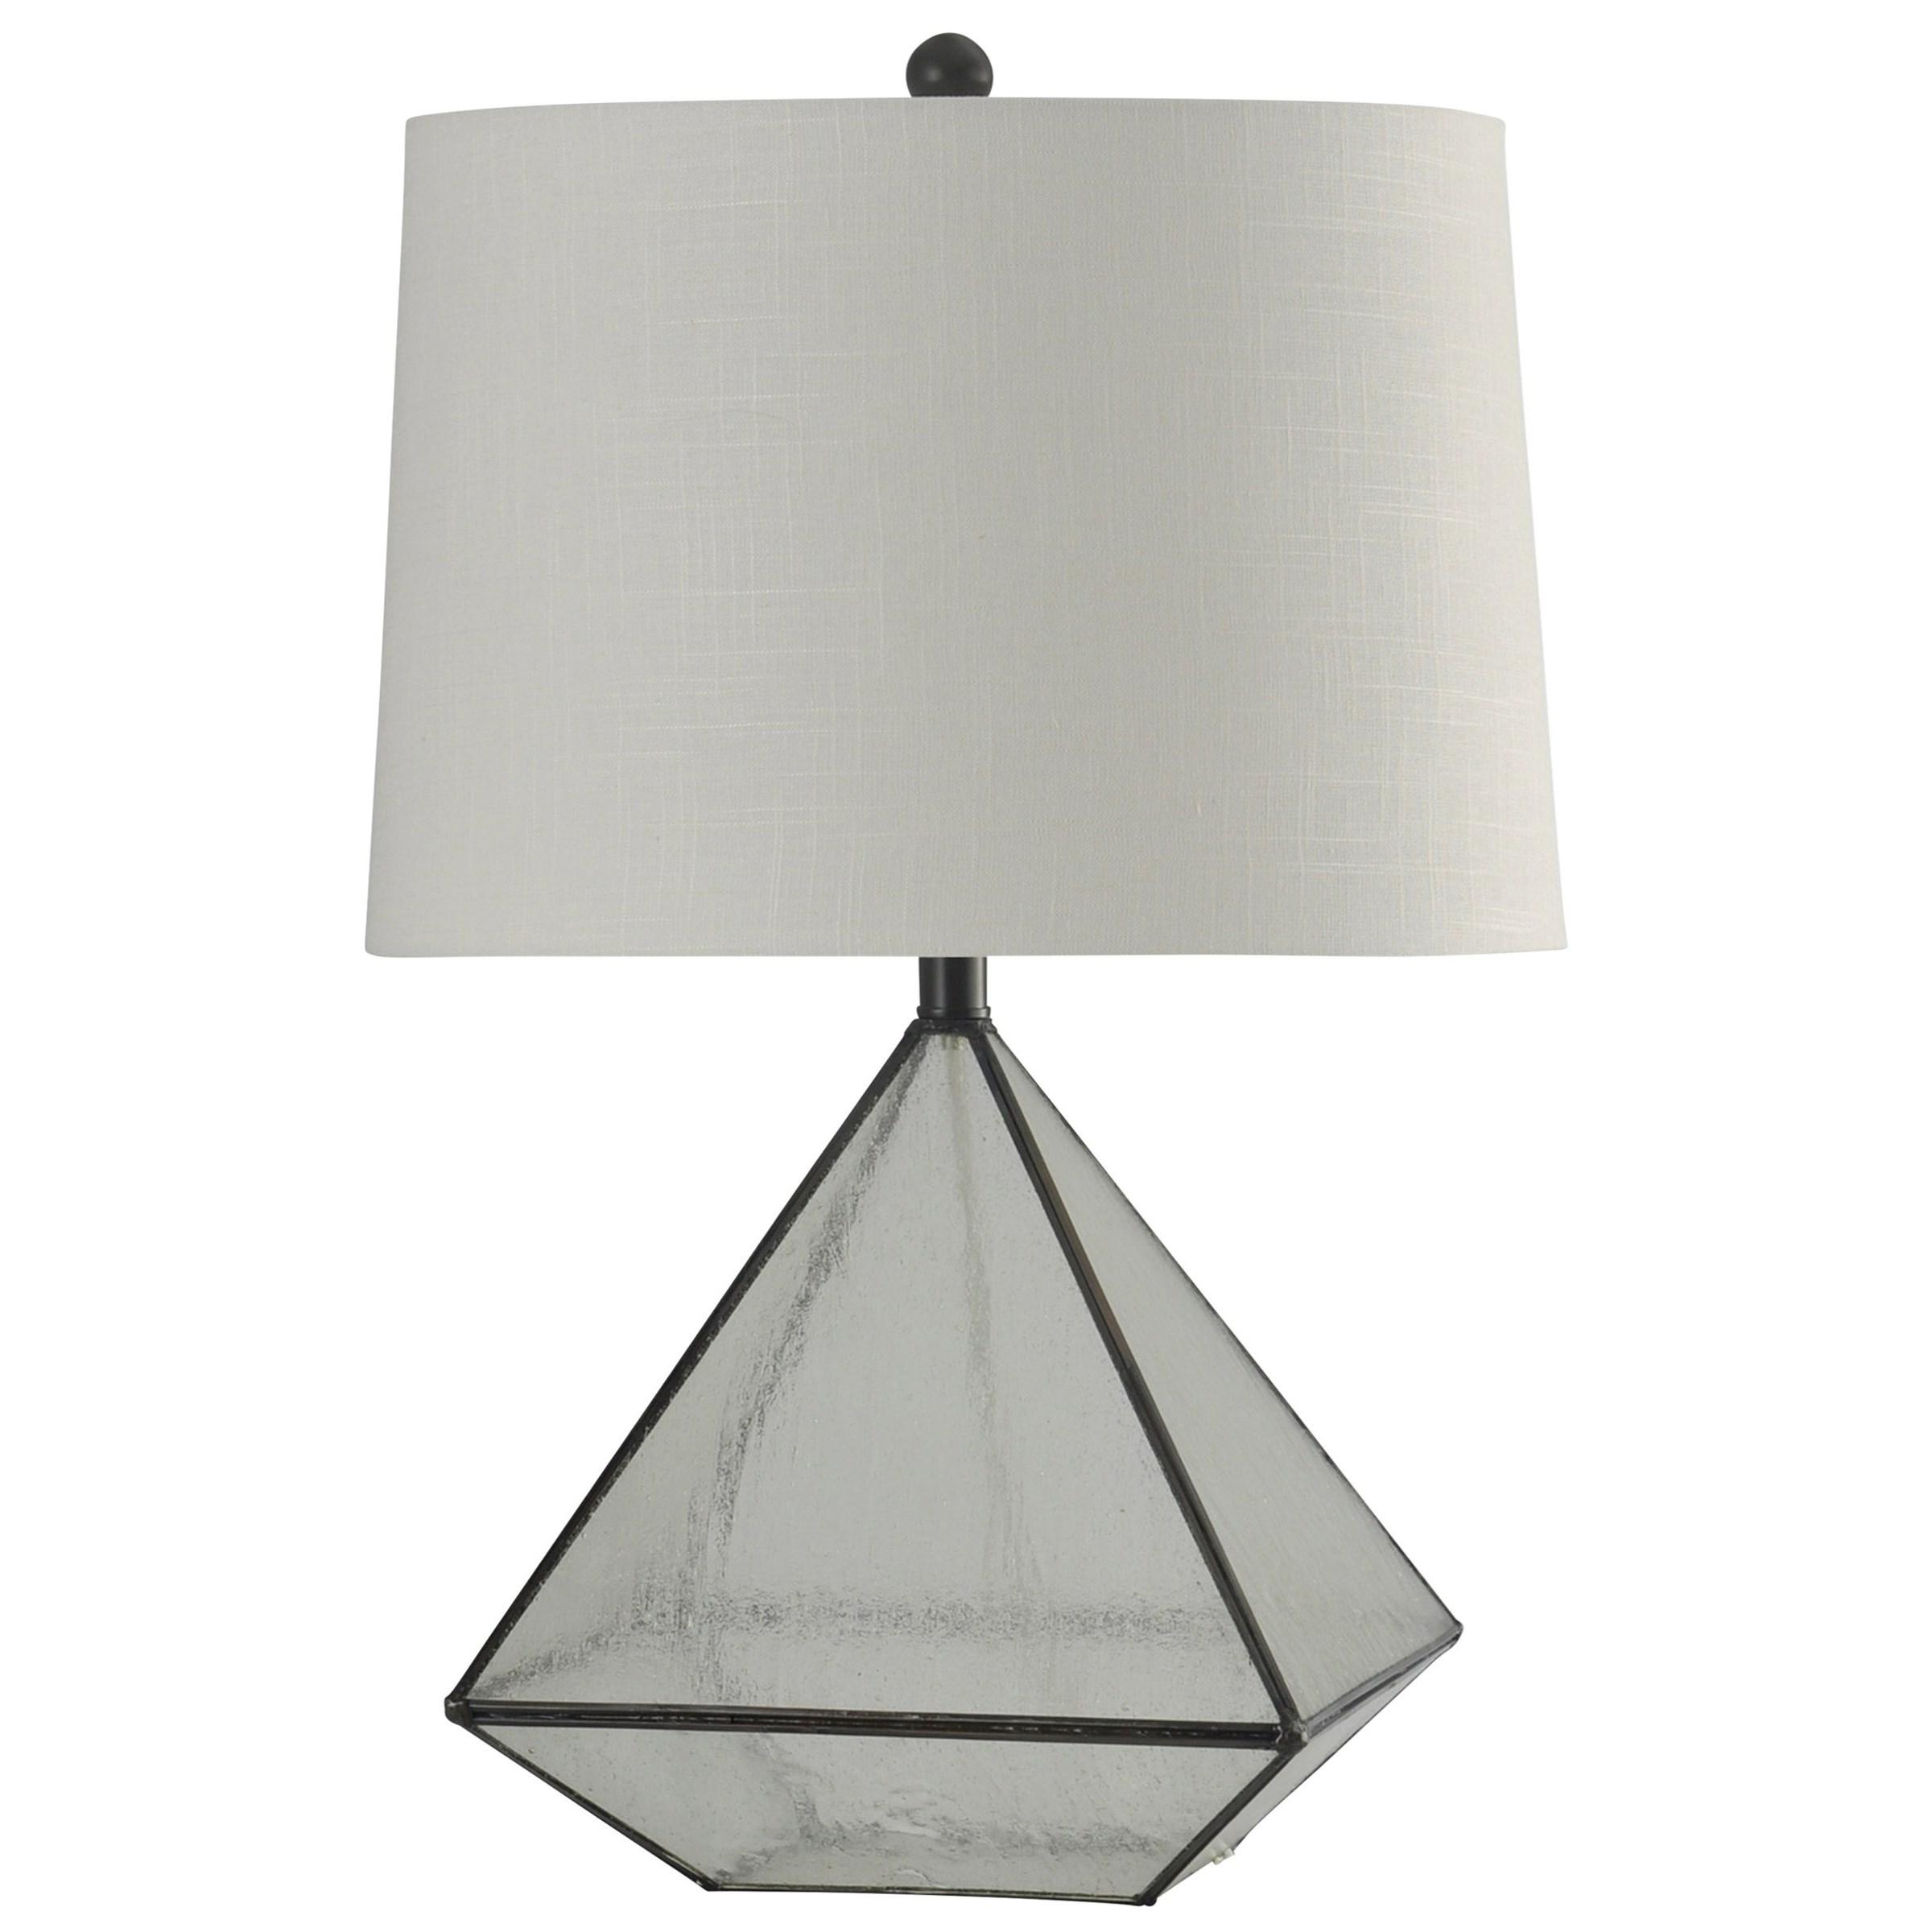 StyleCraft Lamps Medallion Glass Pane Table Lamp